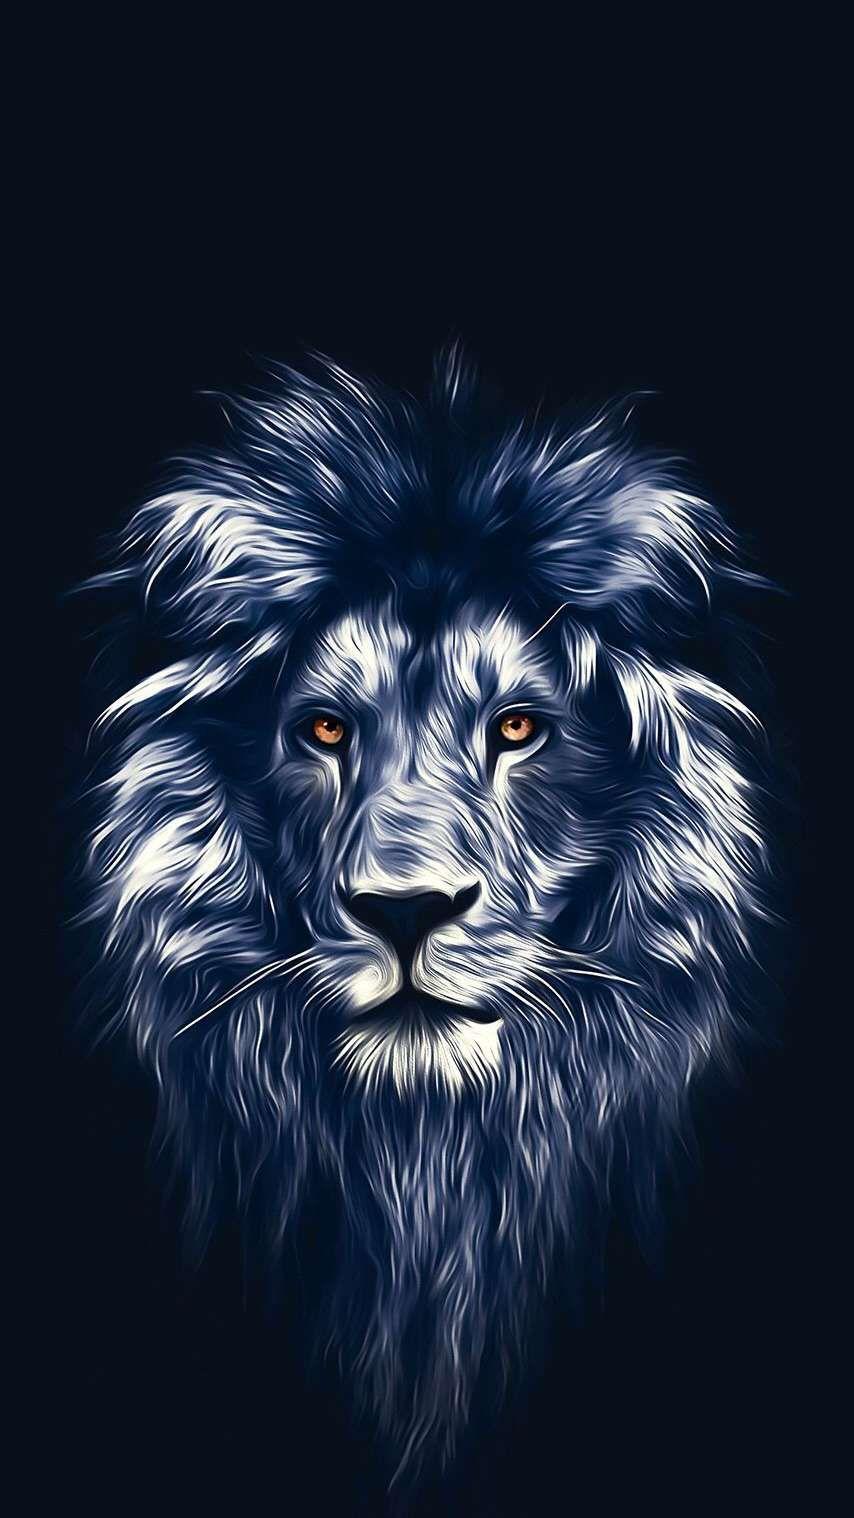 Lion Face Art Iphone Wallpaper - Artistic Wallpaper For Iphone , HD Wallpaper & Backgrounds